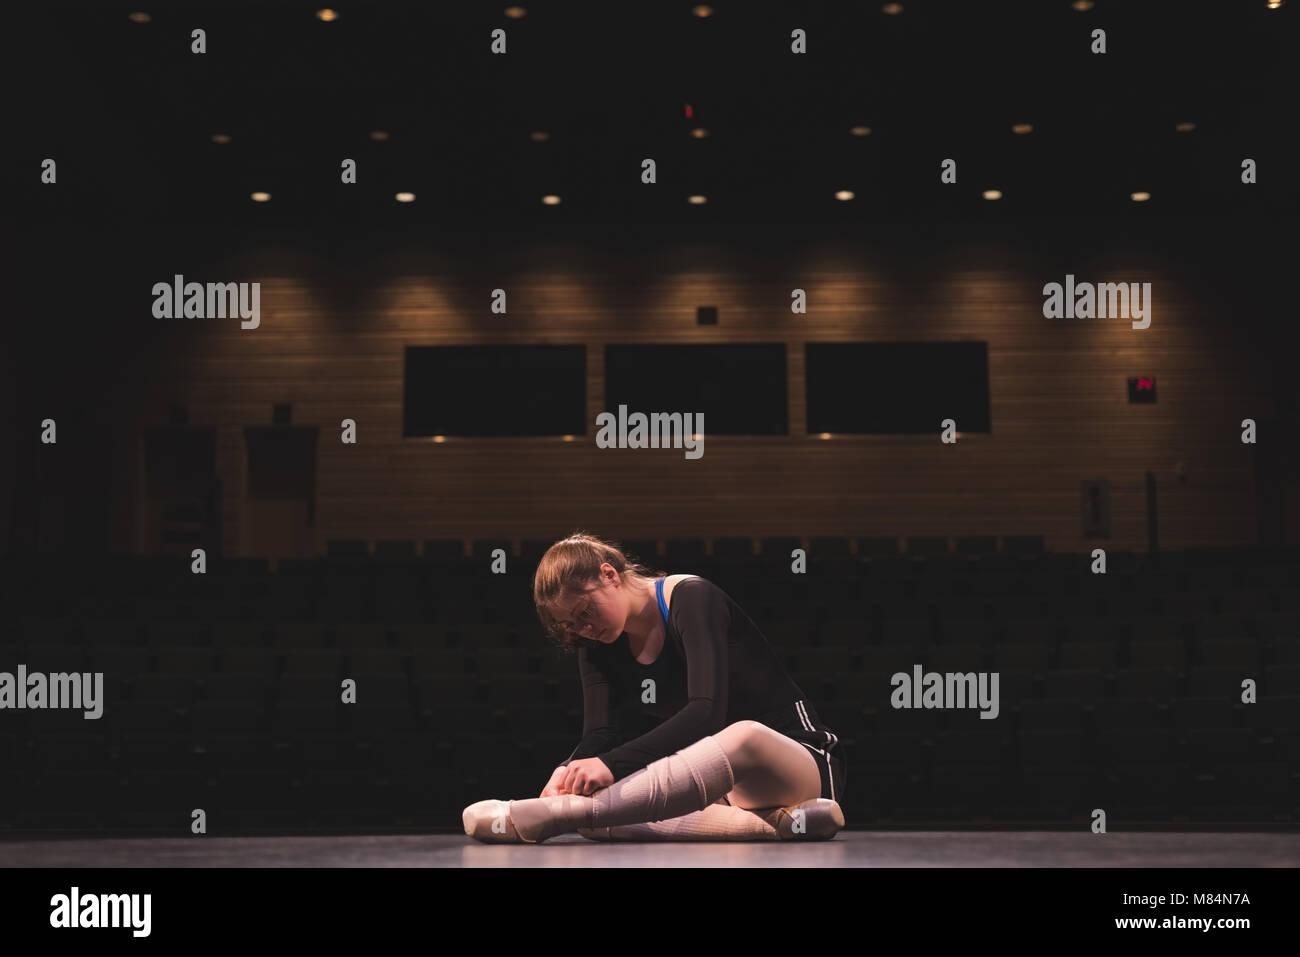 Ballet dancer wearing ballet shoe on stage - Stock Image